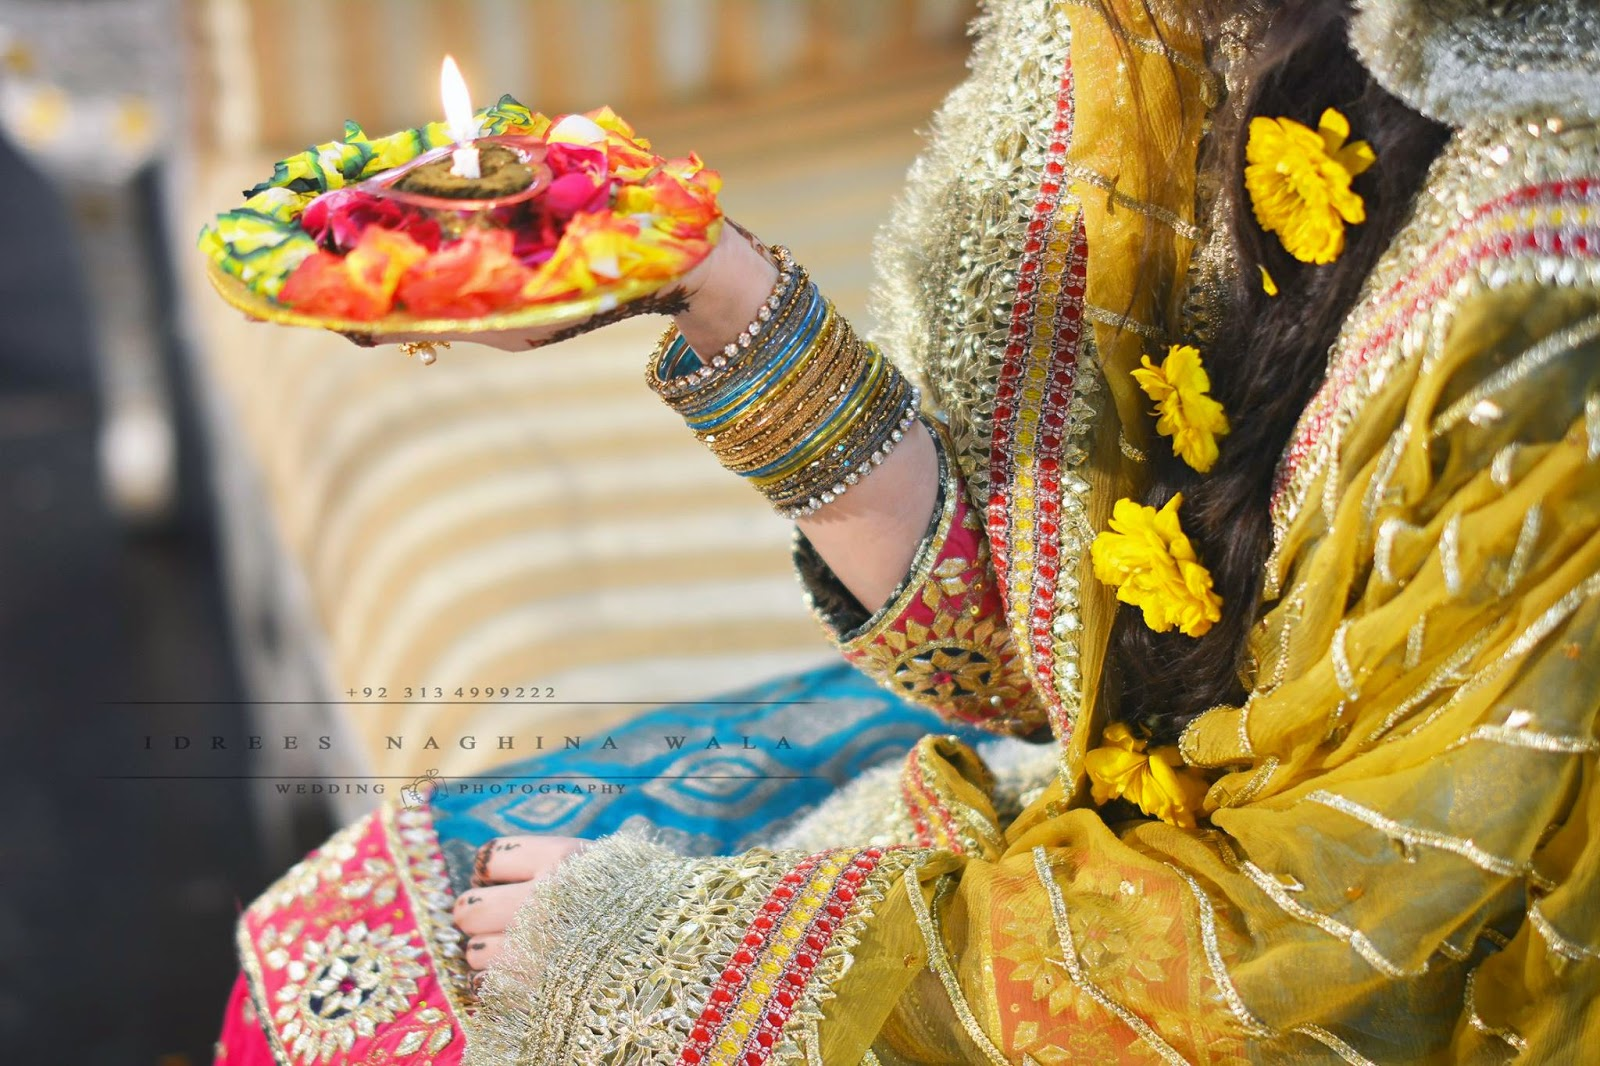 Mehndi Bridal Photography : Wedding photography by idrees naghina wala in lahore pakistan